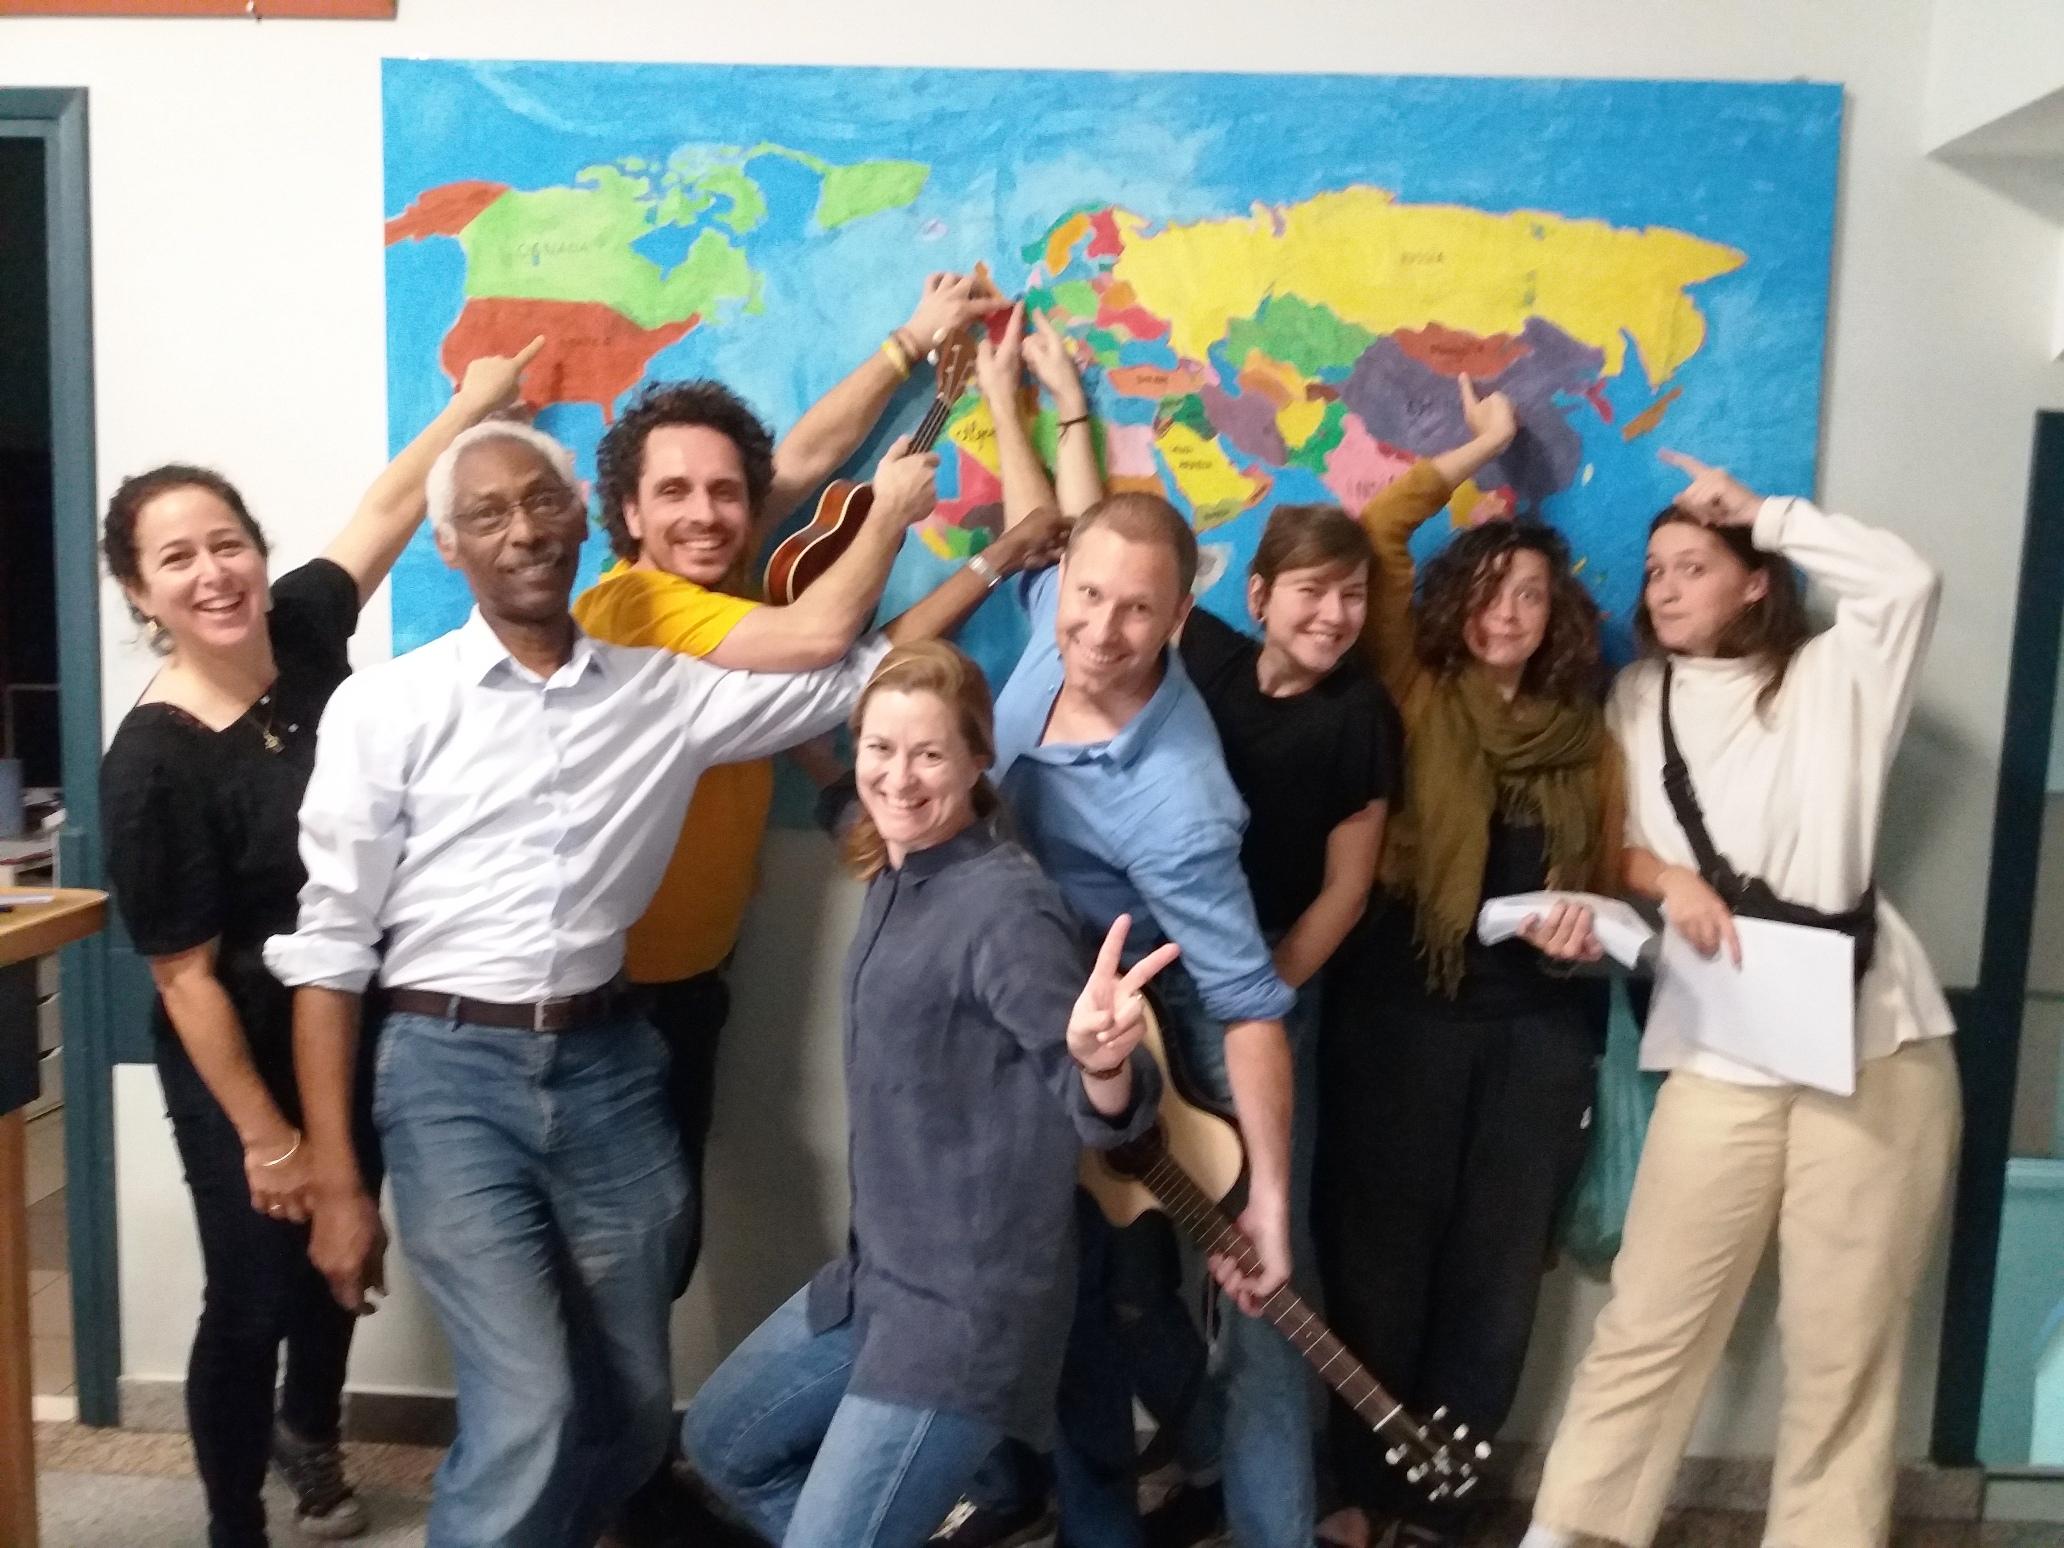 WELCOMMON HOSTEL: ένα εξαιρετικό παράδειγμα υπεύθυνης, οικολογικής-κοινωνικής βιωσιμότητας